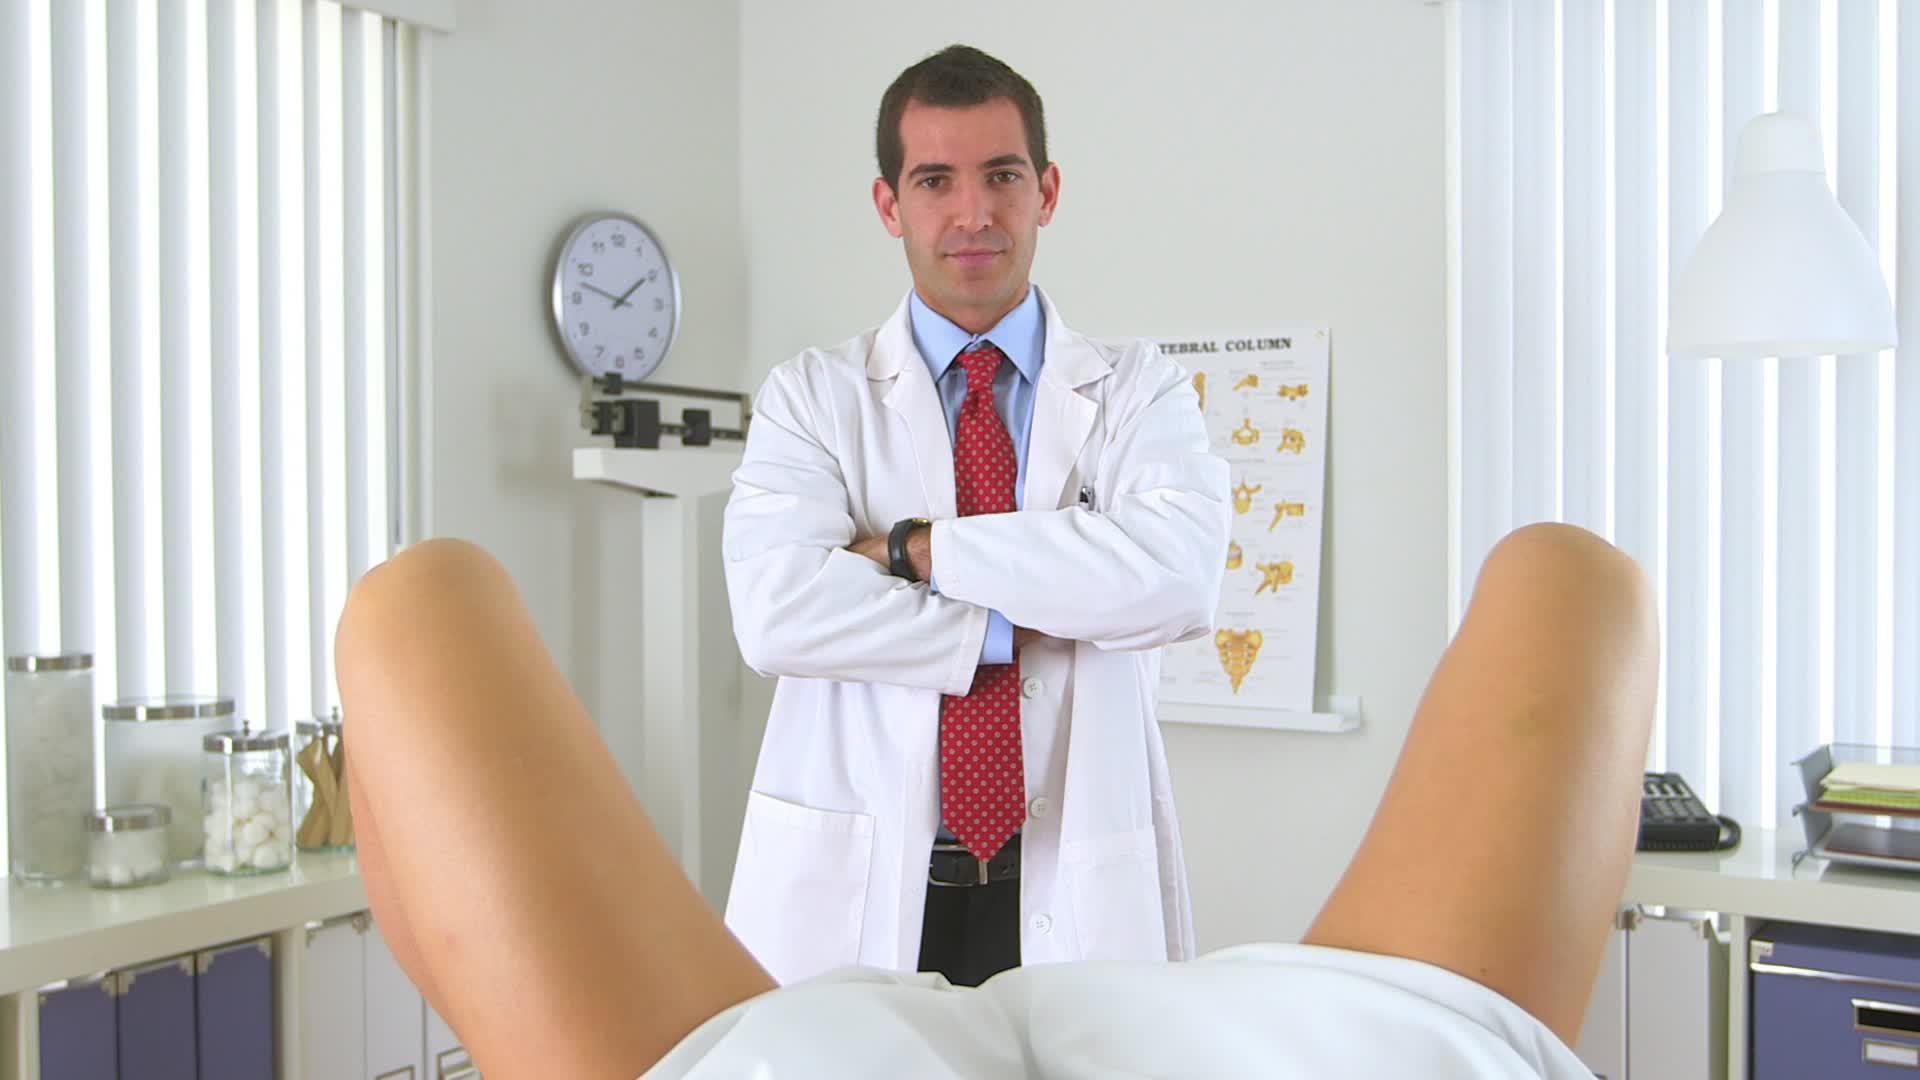 гинеколог мужчина и пациентка